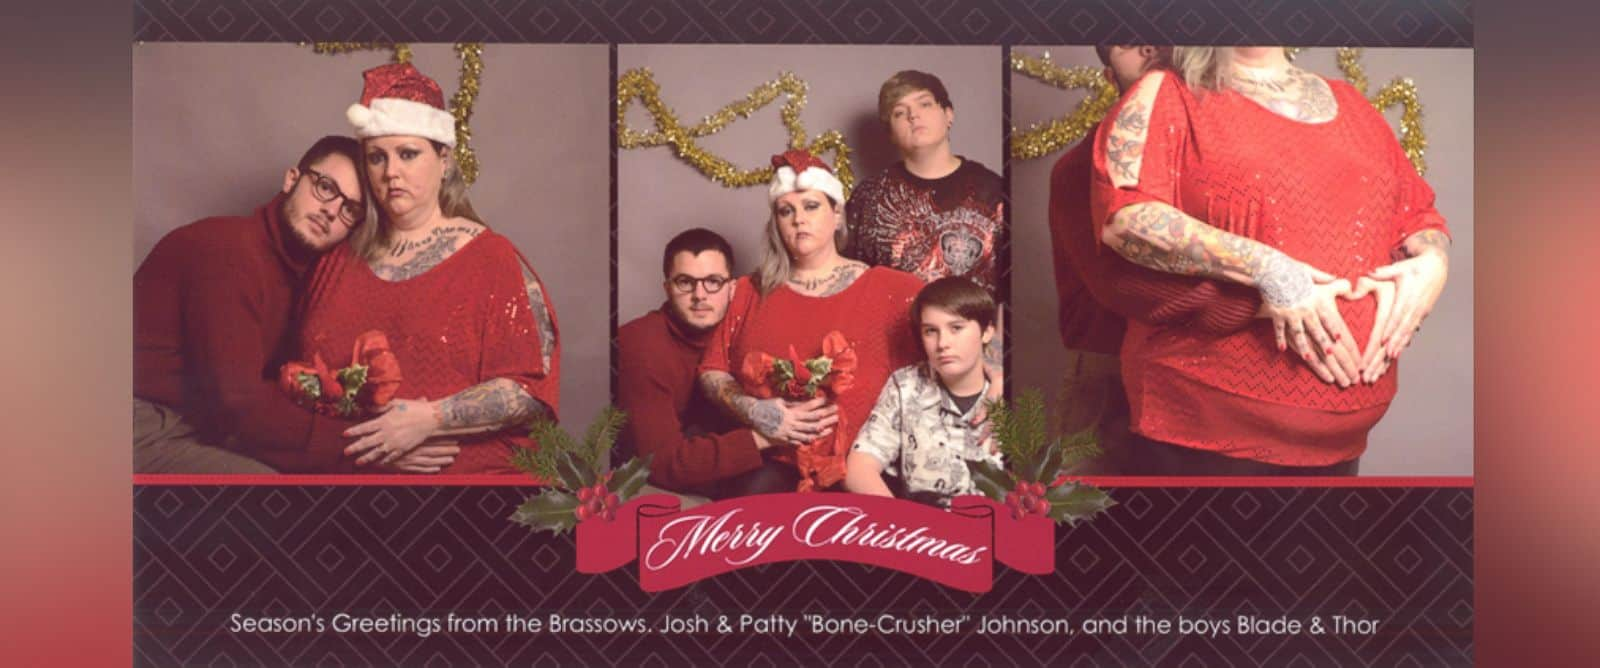 Reputable Family Photo Pose Ideas Michigan Student Hires Fake Family Card Family Photo Pose Ideas Collections Photo Family S Pinterest Family S Snow photos Christmas Family Pictures